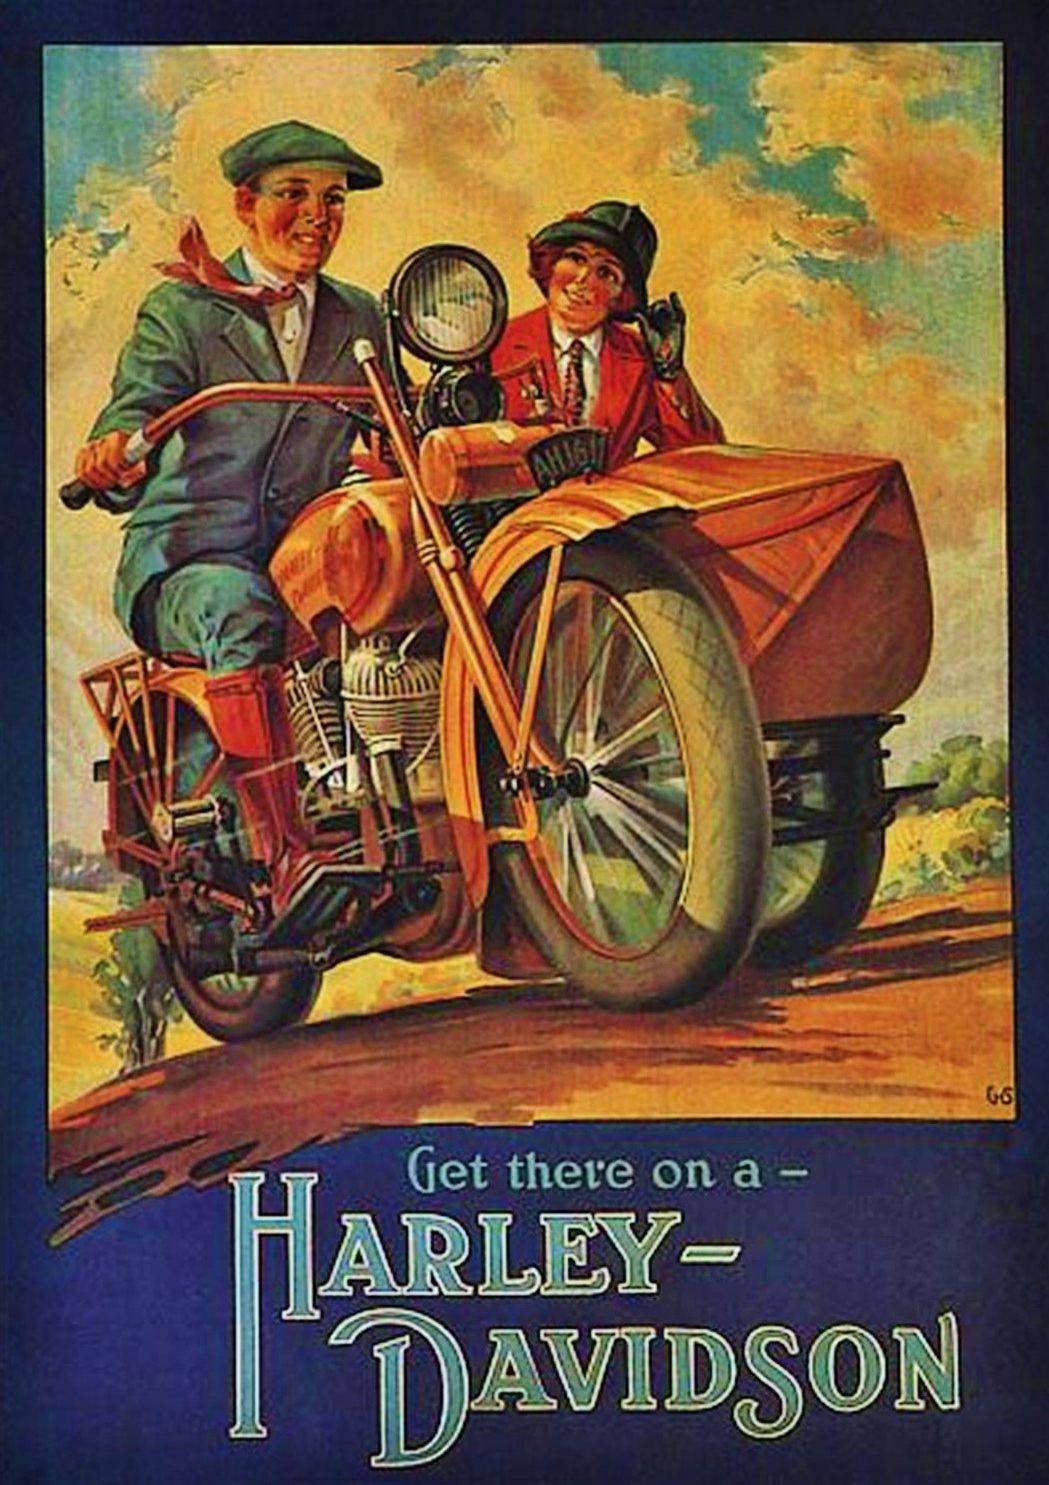 Vortex Illustrations Vintage Motorcycle Posters Harley Davidson Posters Harley Davidson Museum